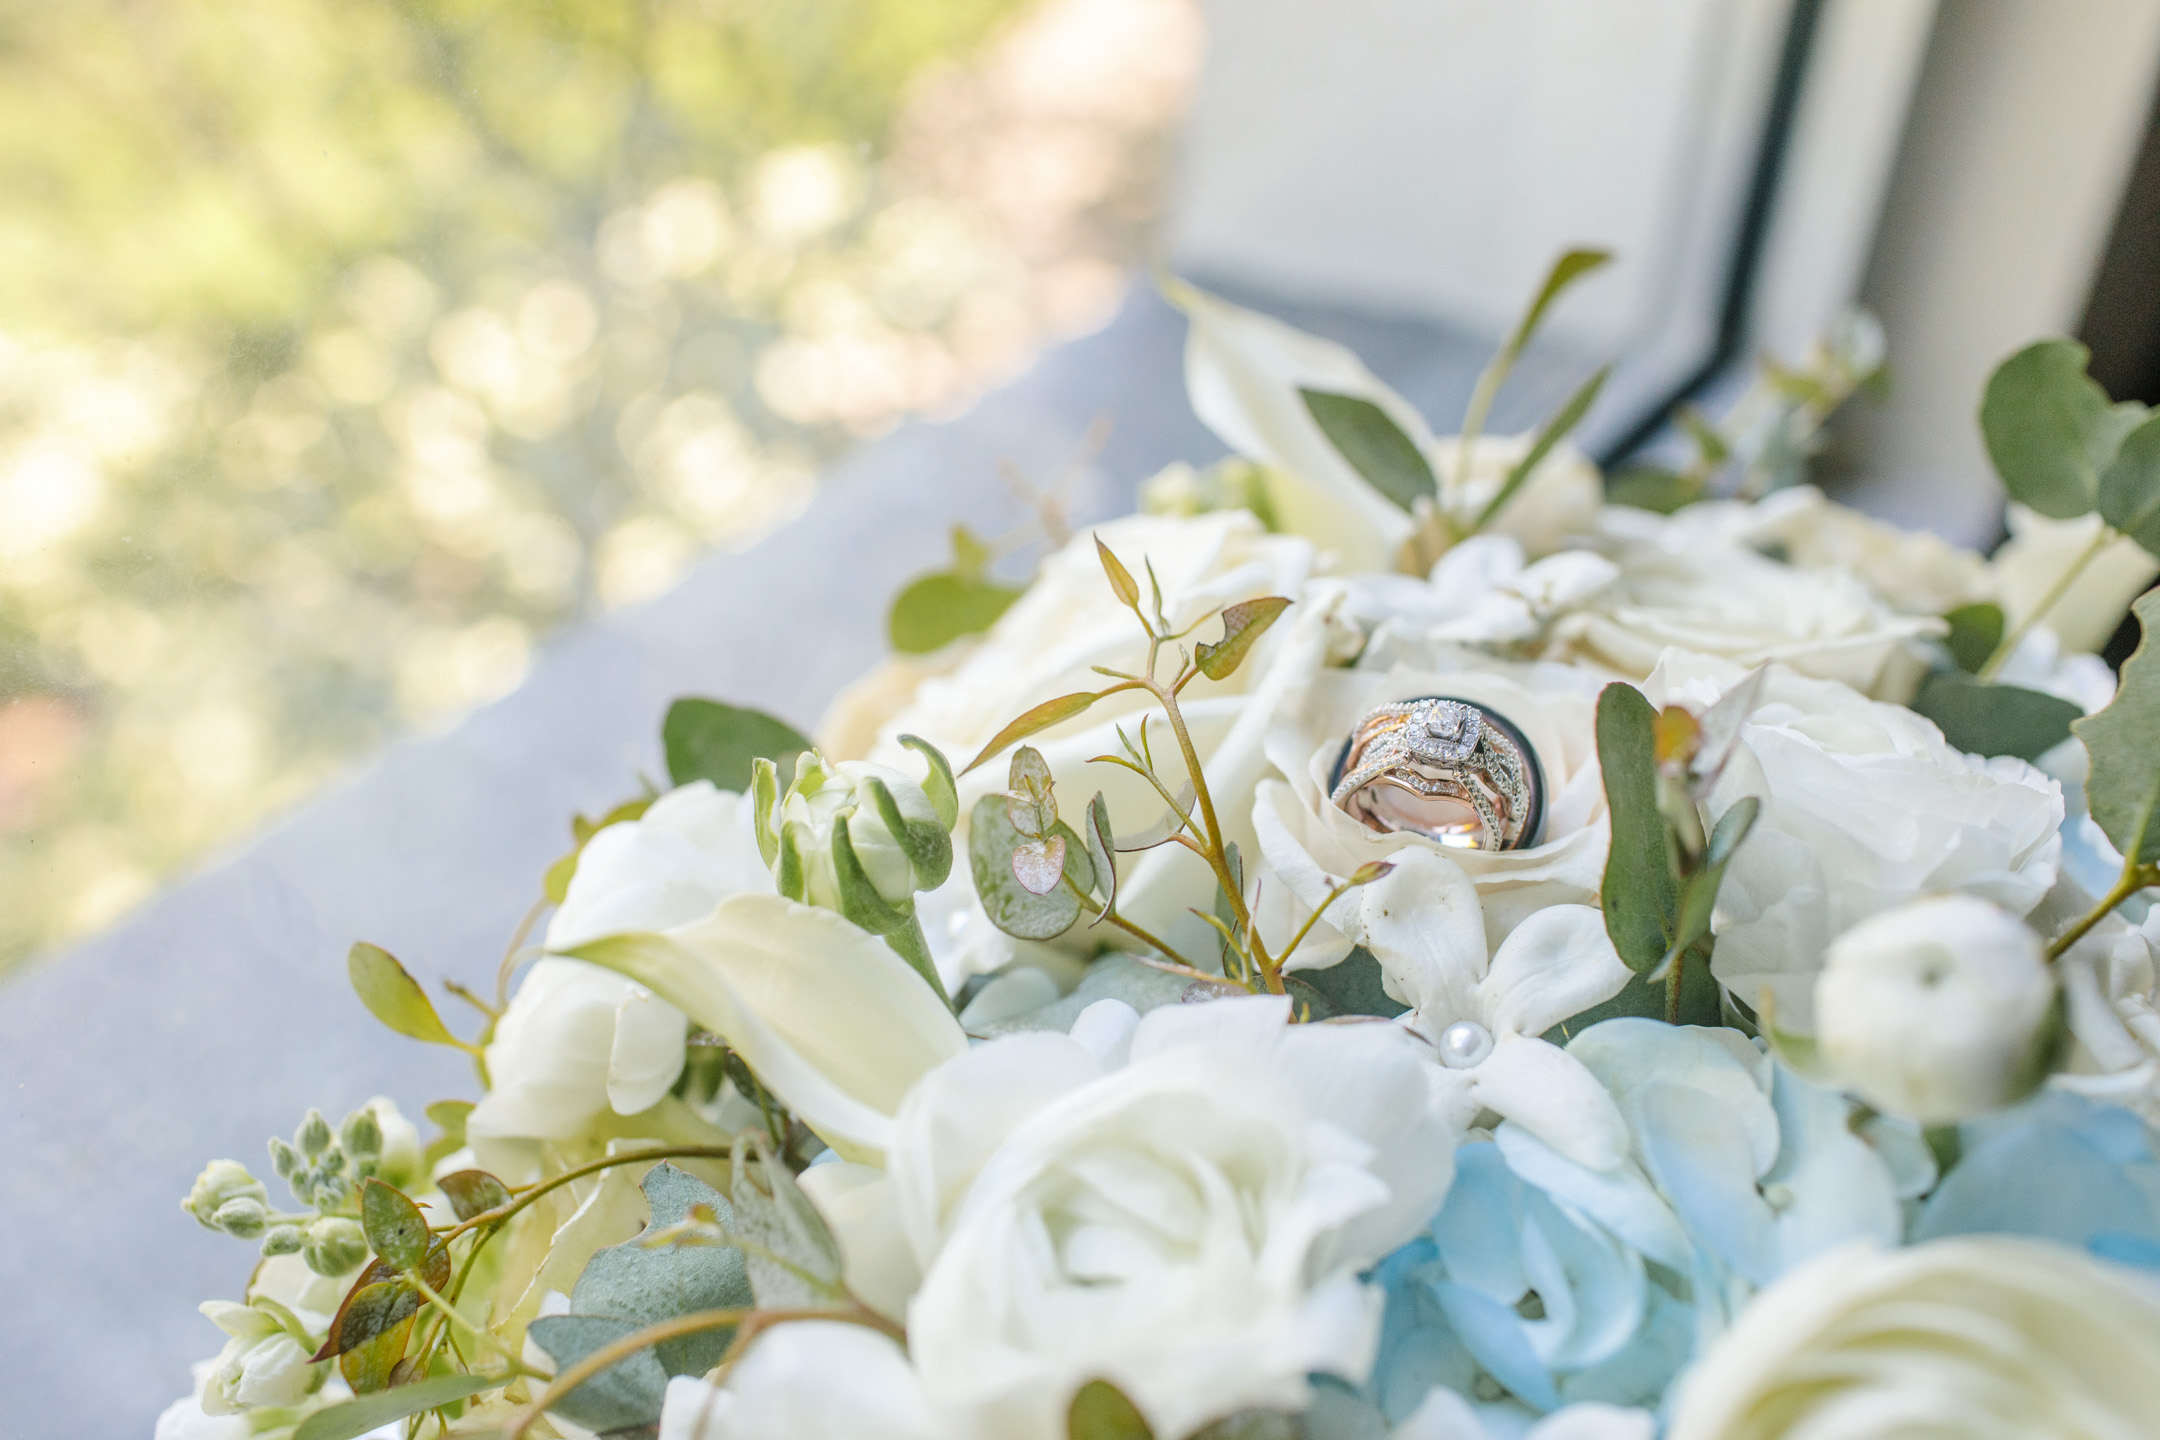 sparkly wedding ring ornate